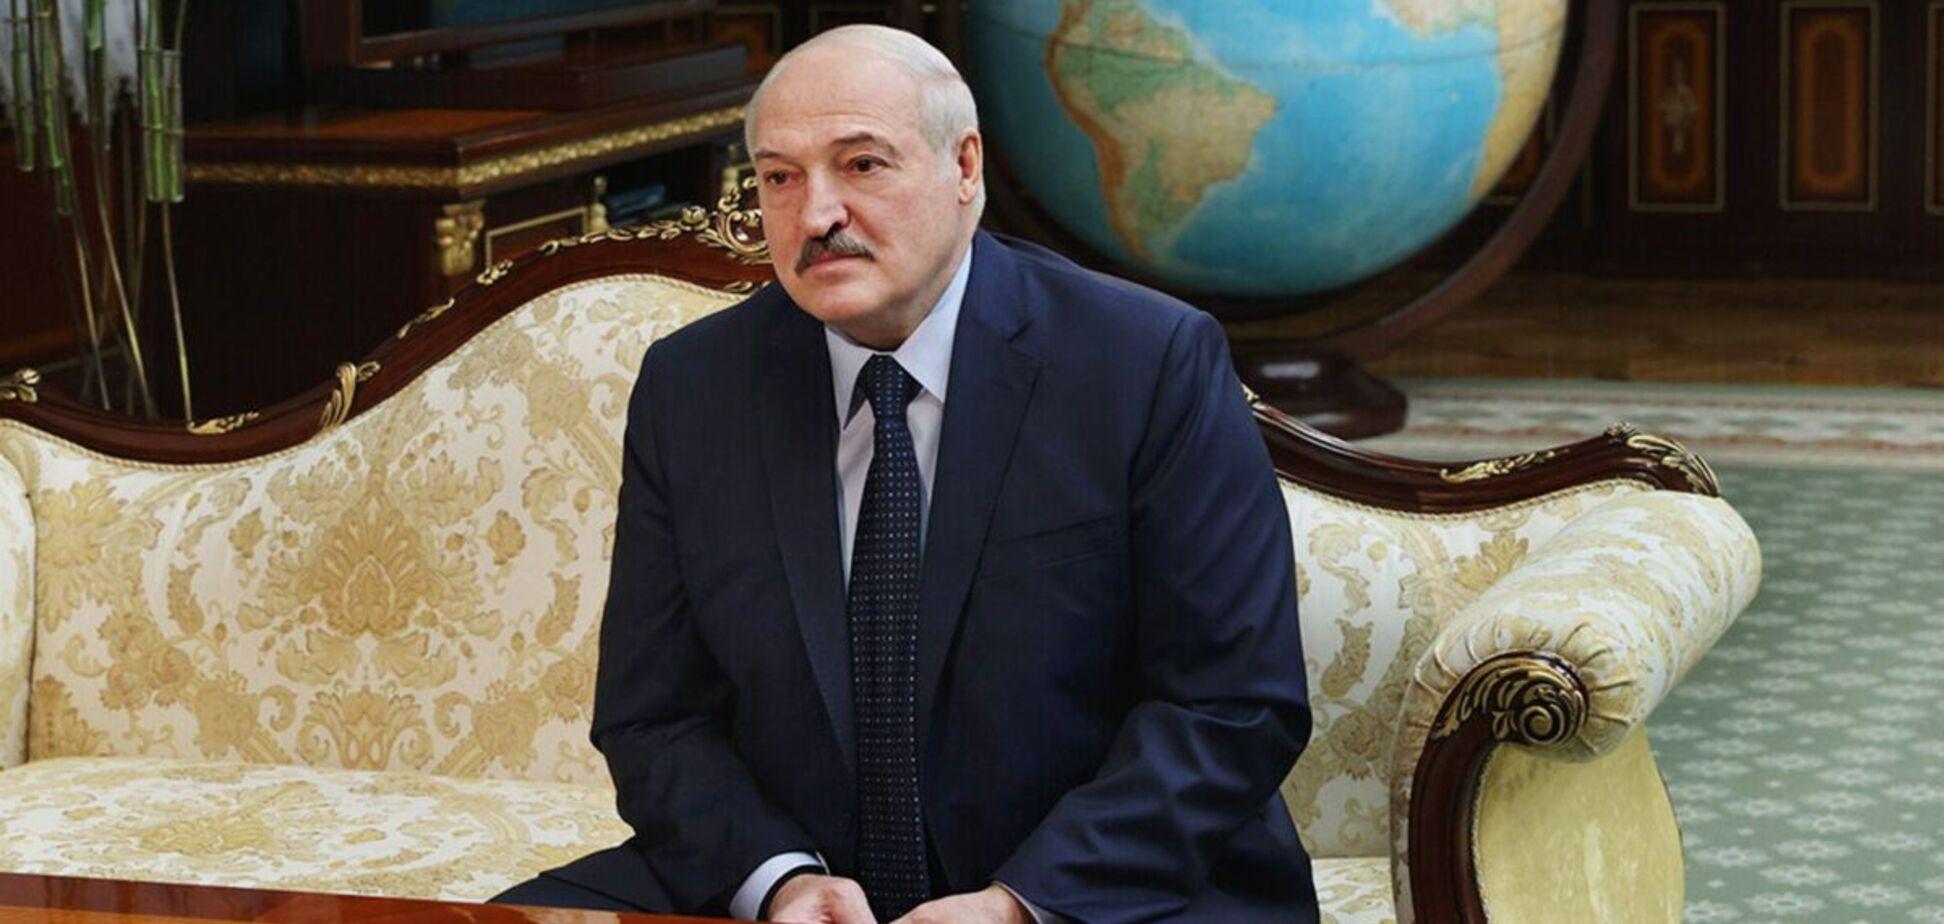 Лукашенко озвучив план на випадок, якщо 'президента застрелять'